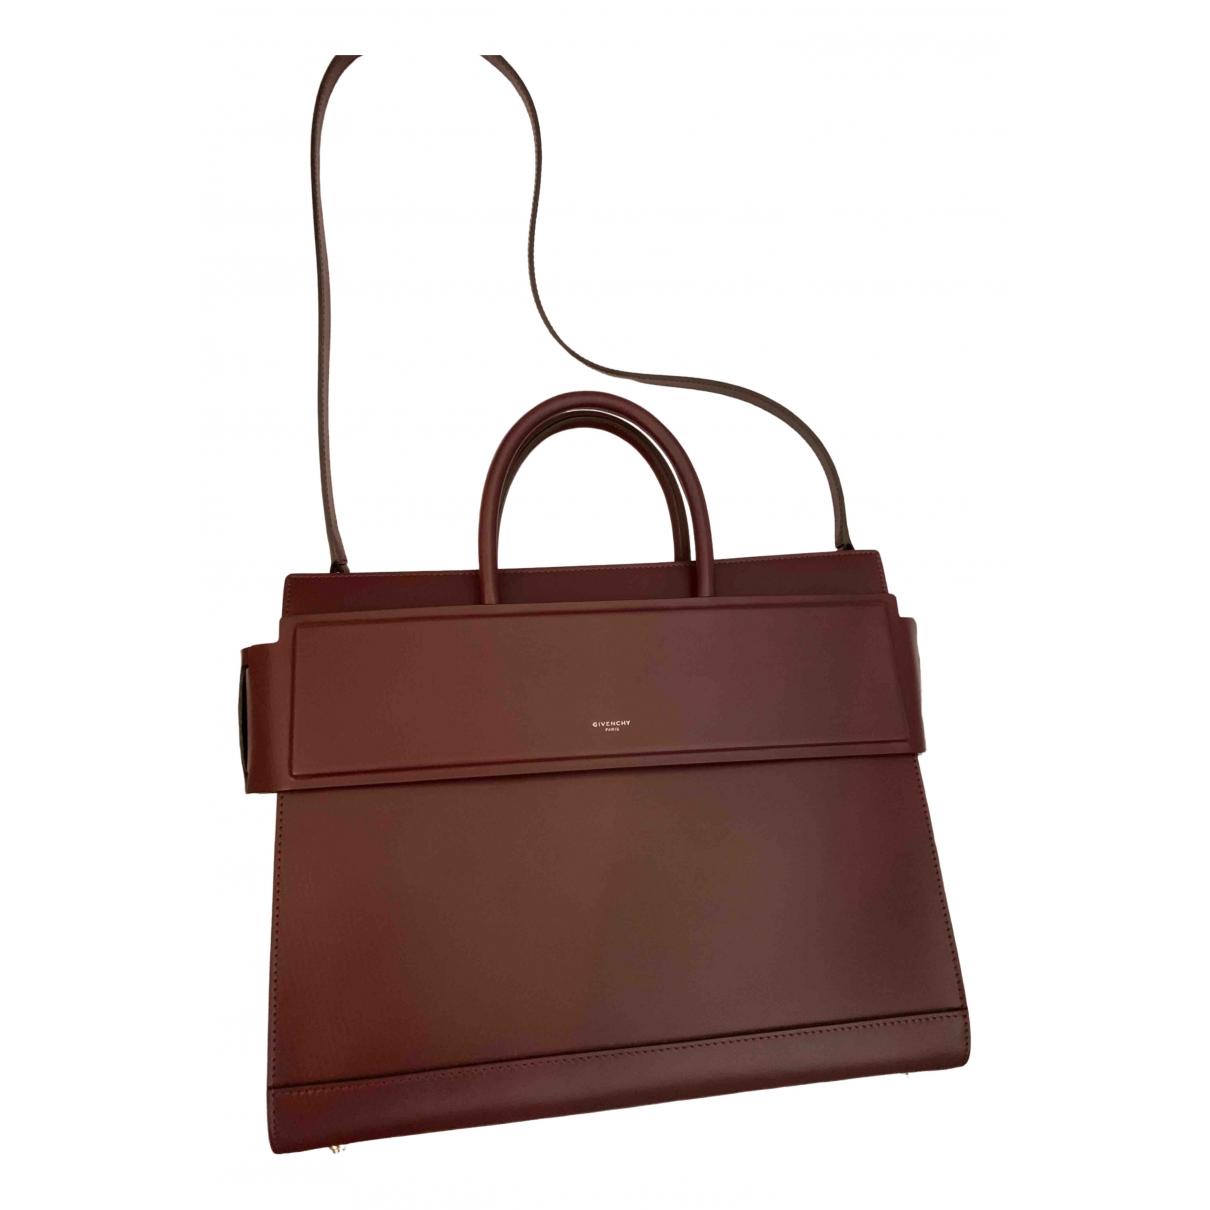 Givenchy Horizon Burgundy Leather handbag for Women \N